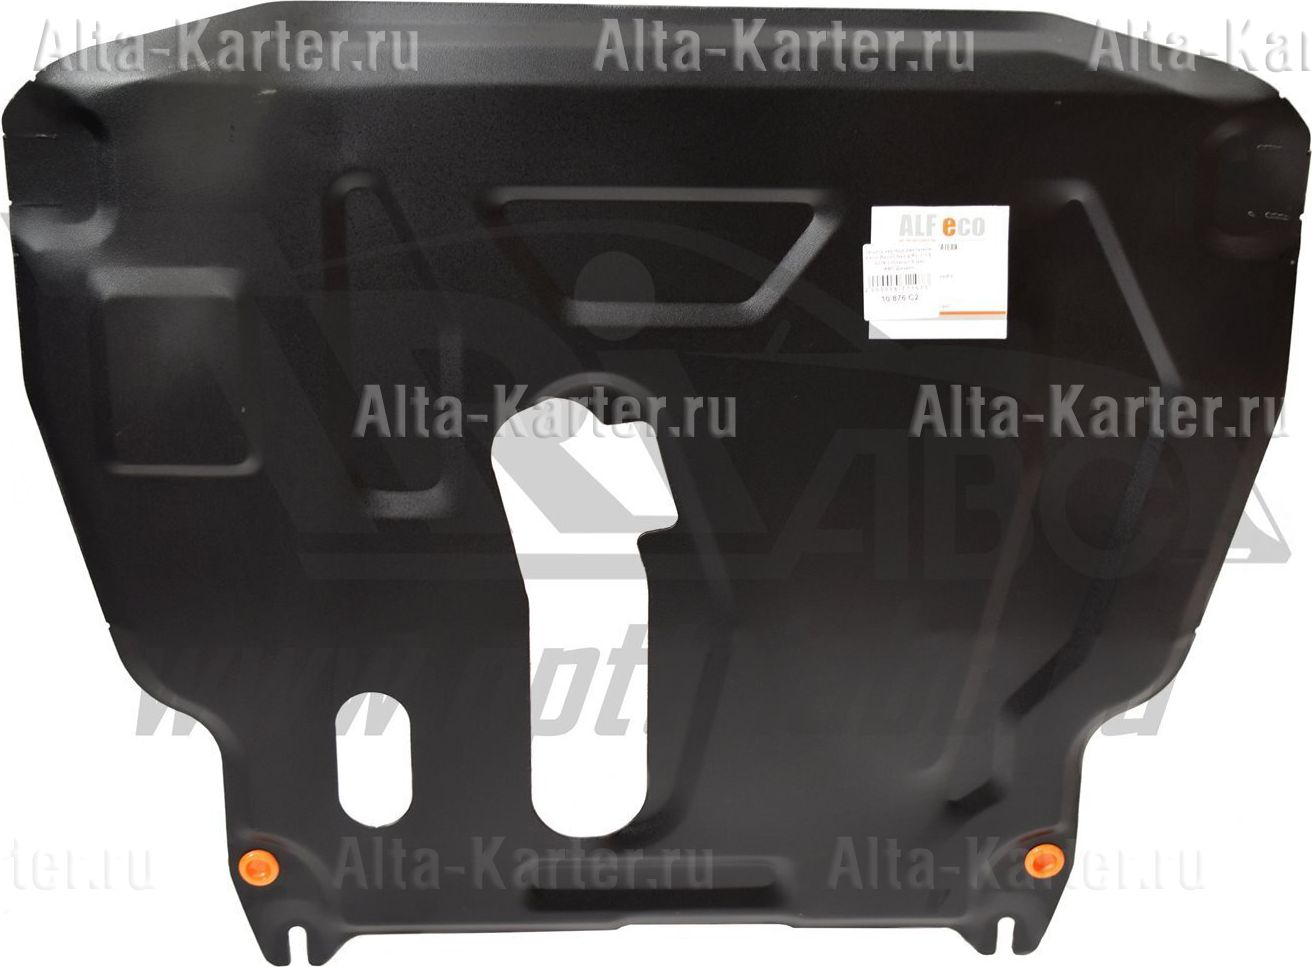 Защита Alfeco для картера и КПП Ravon R3 Nexia 2015-2021. Артикул ALF.05.05 st